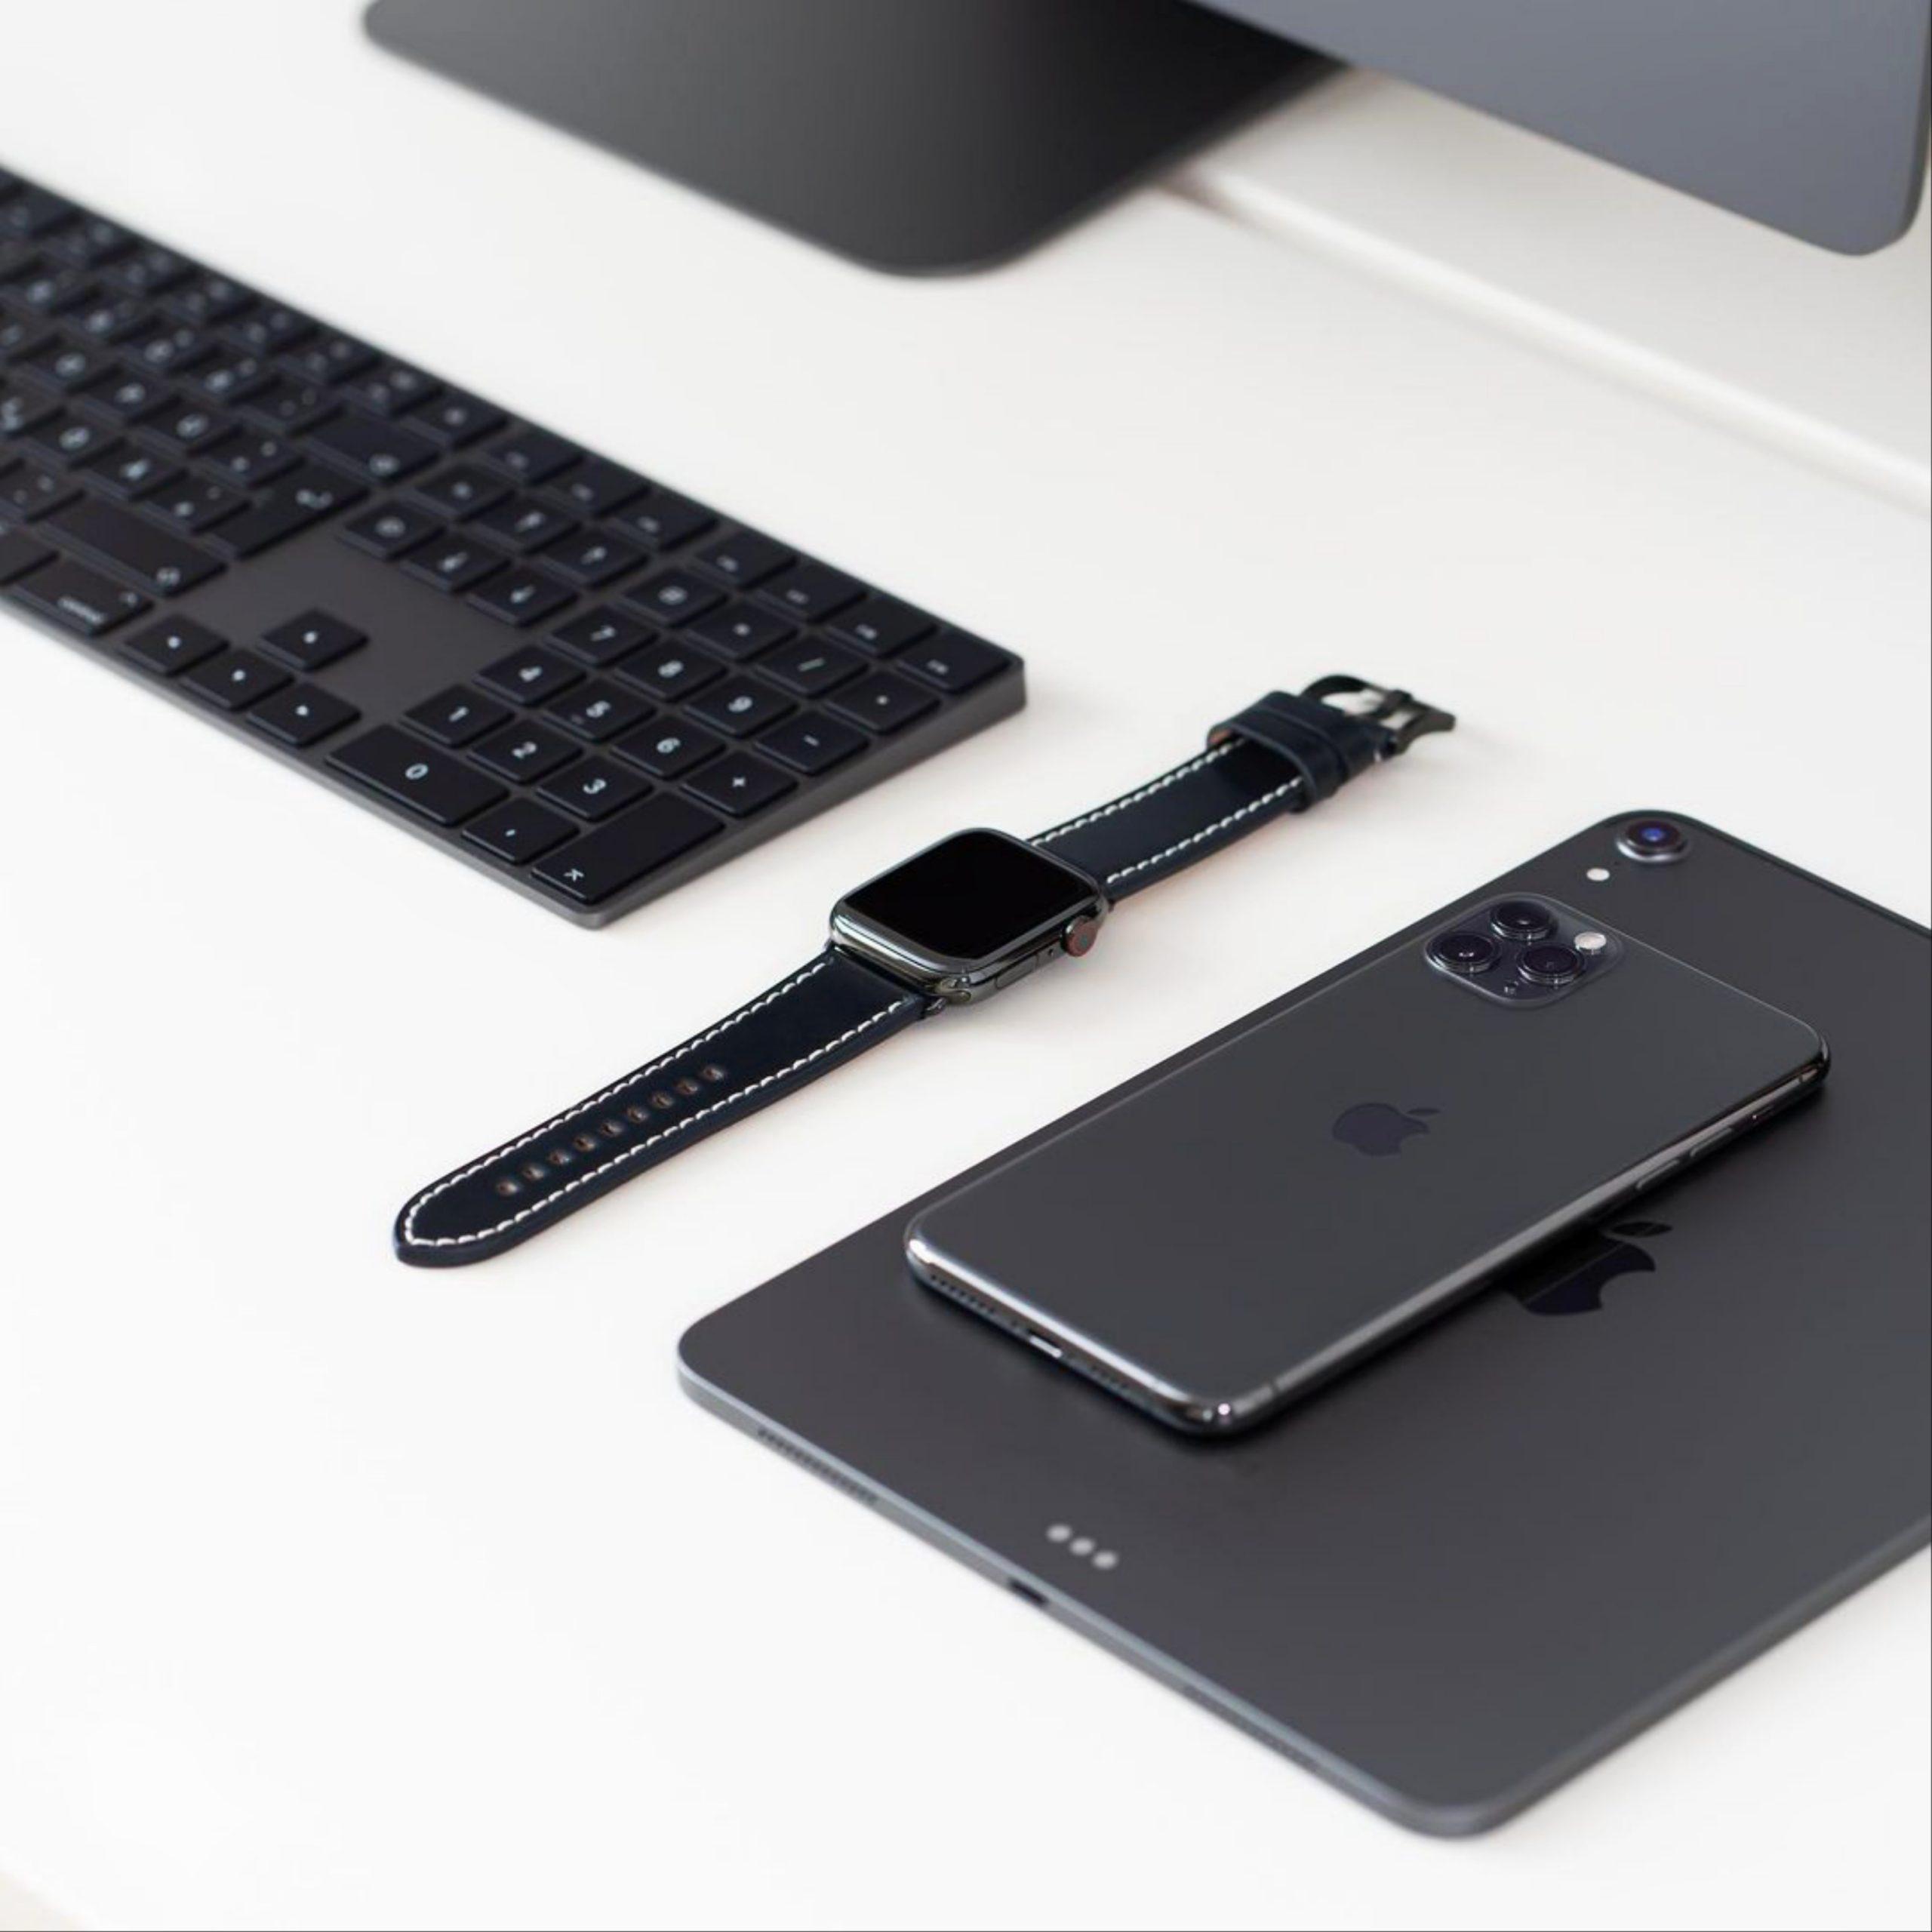 mobile, tablet, watch, keyboard